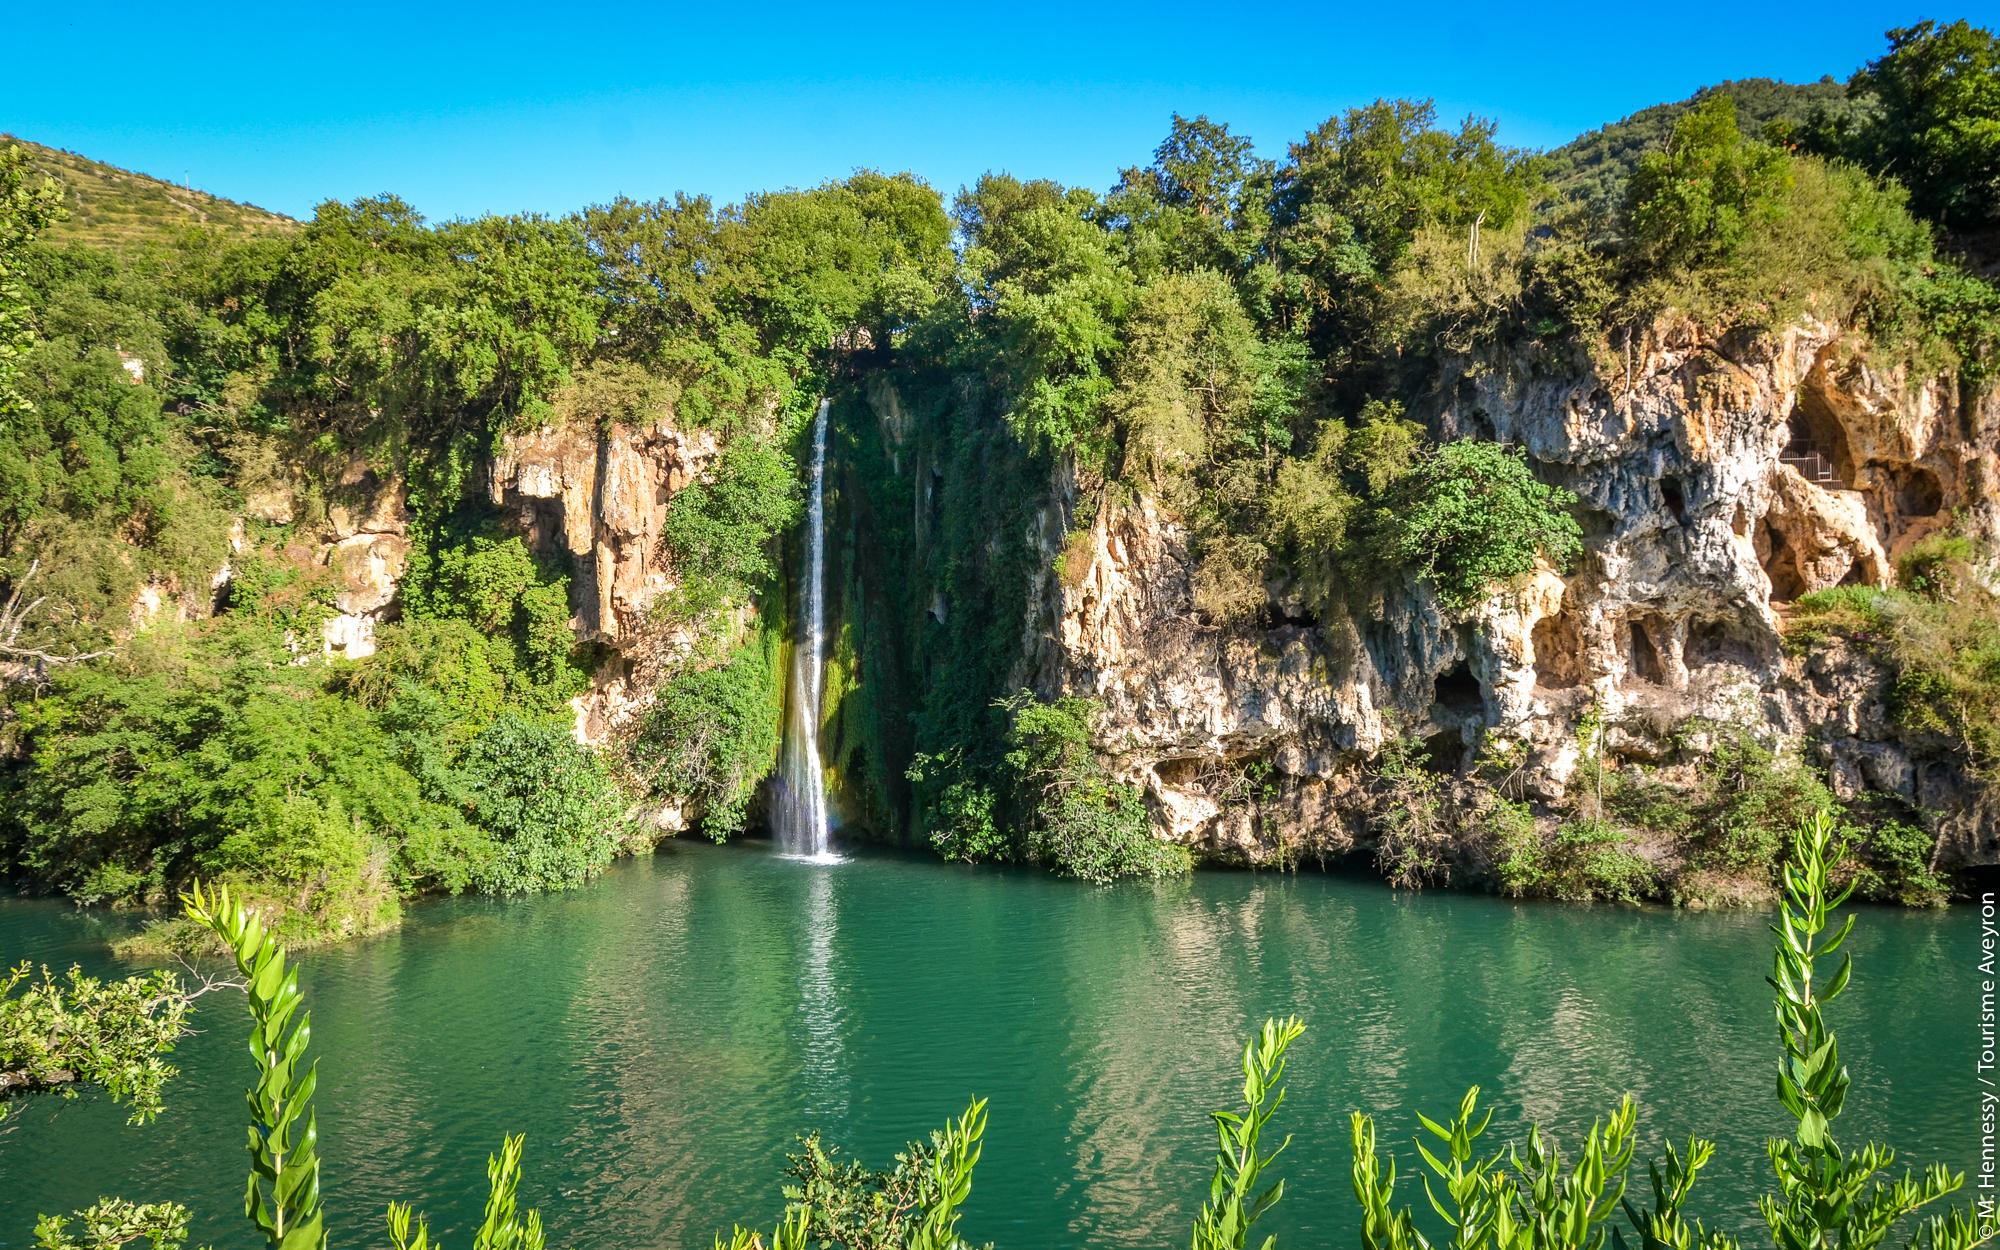 Cascade des Baumes, Saint-Rome-de-Tarn, Vallée du Tarn, Aveyron